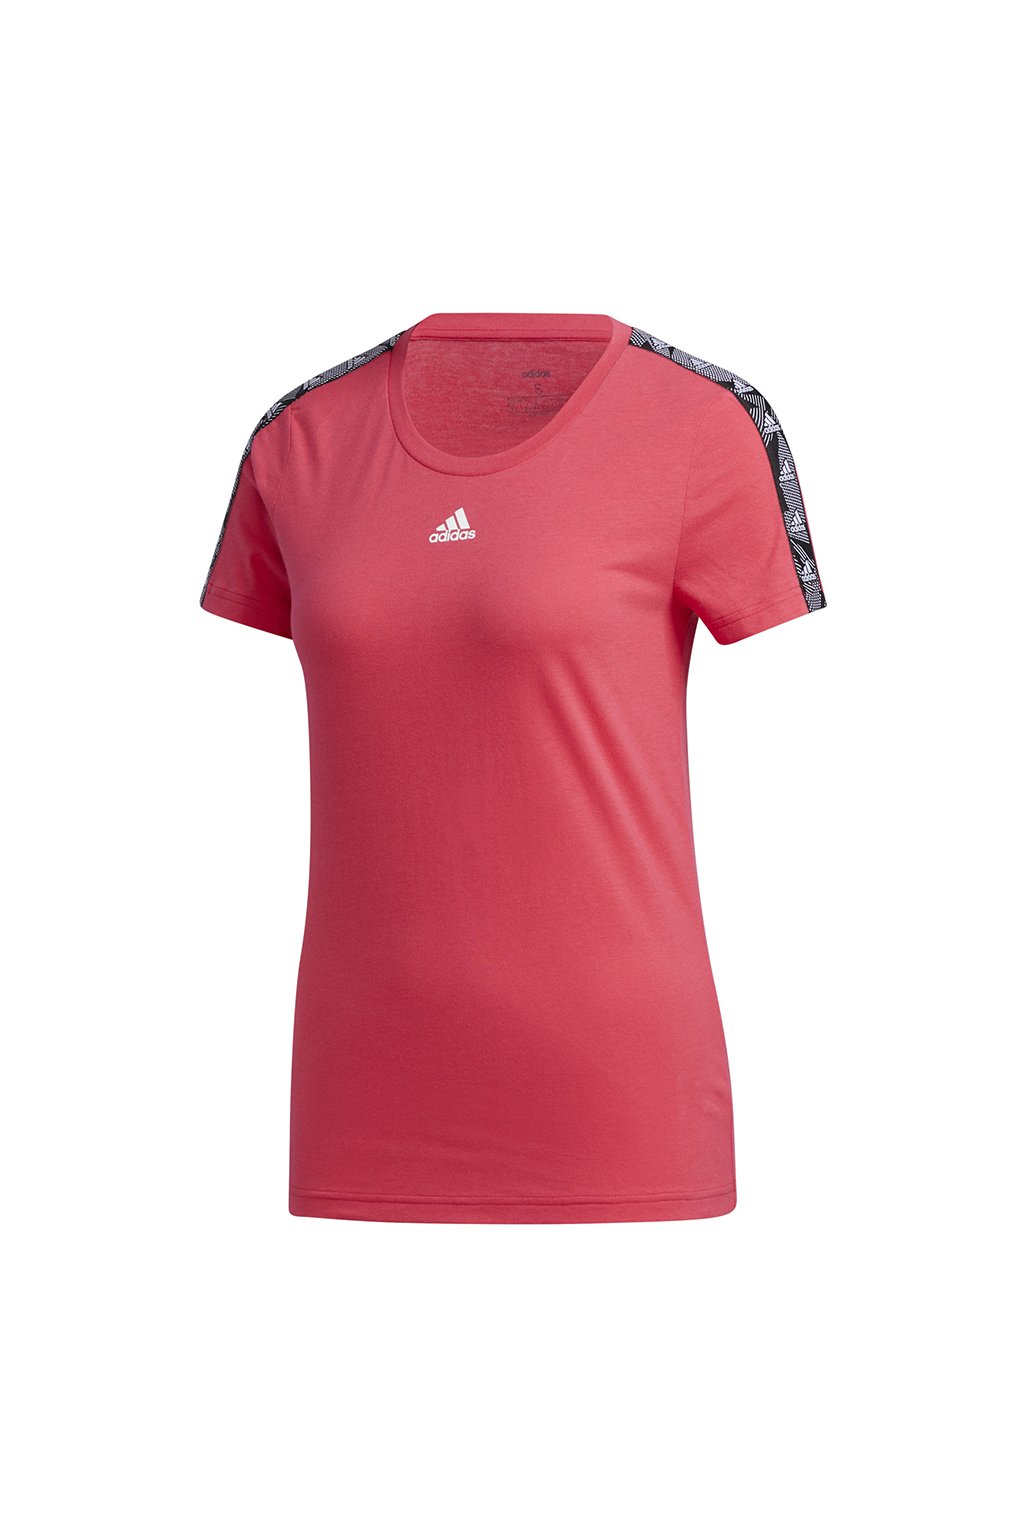 Dámske tričko adidas Essentials Tape Tee ružová GE1133